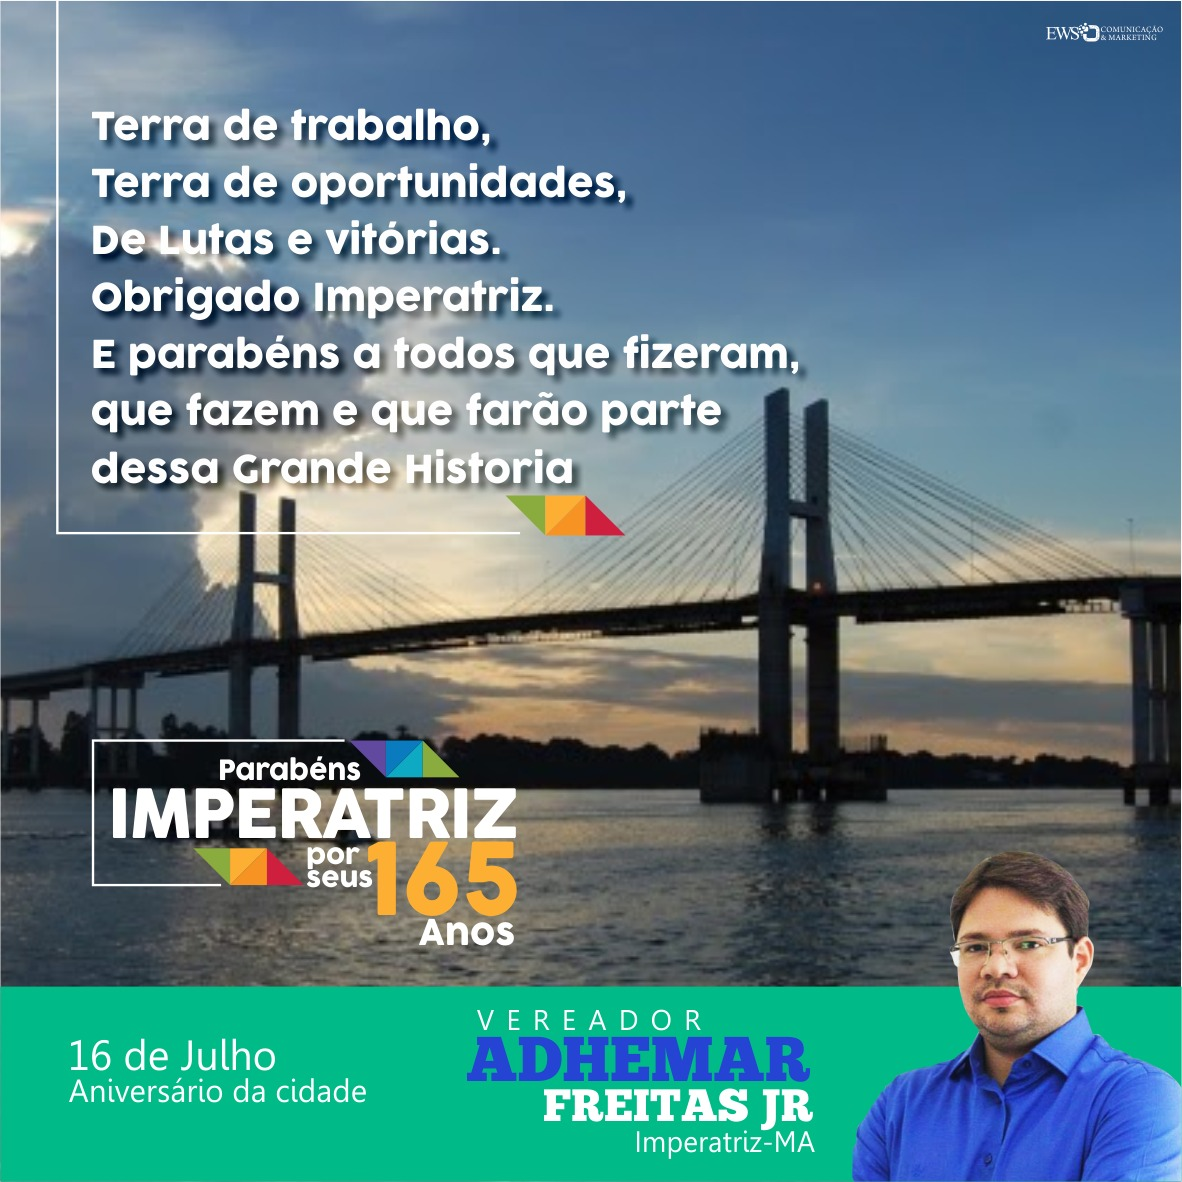 Ver. Ademar Freitas Jr - Imperatriz 165 anos.